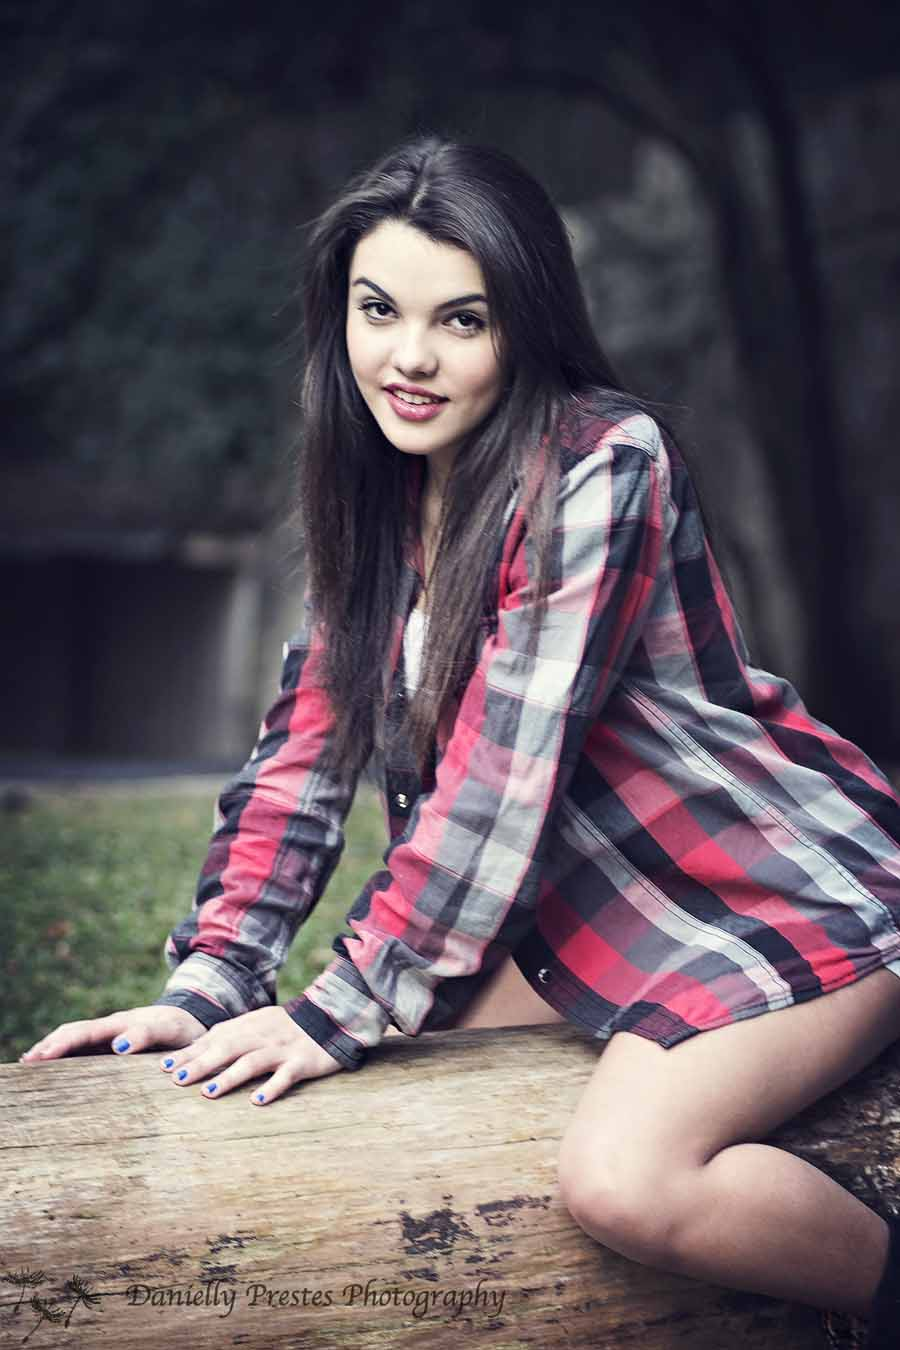 Bruna_178low